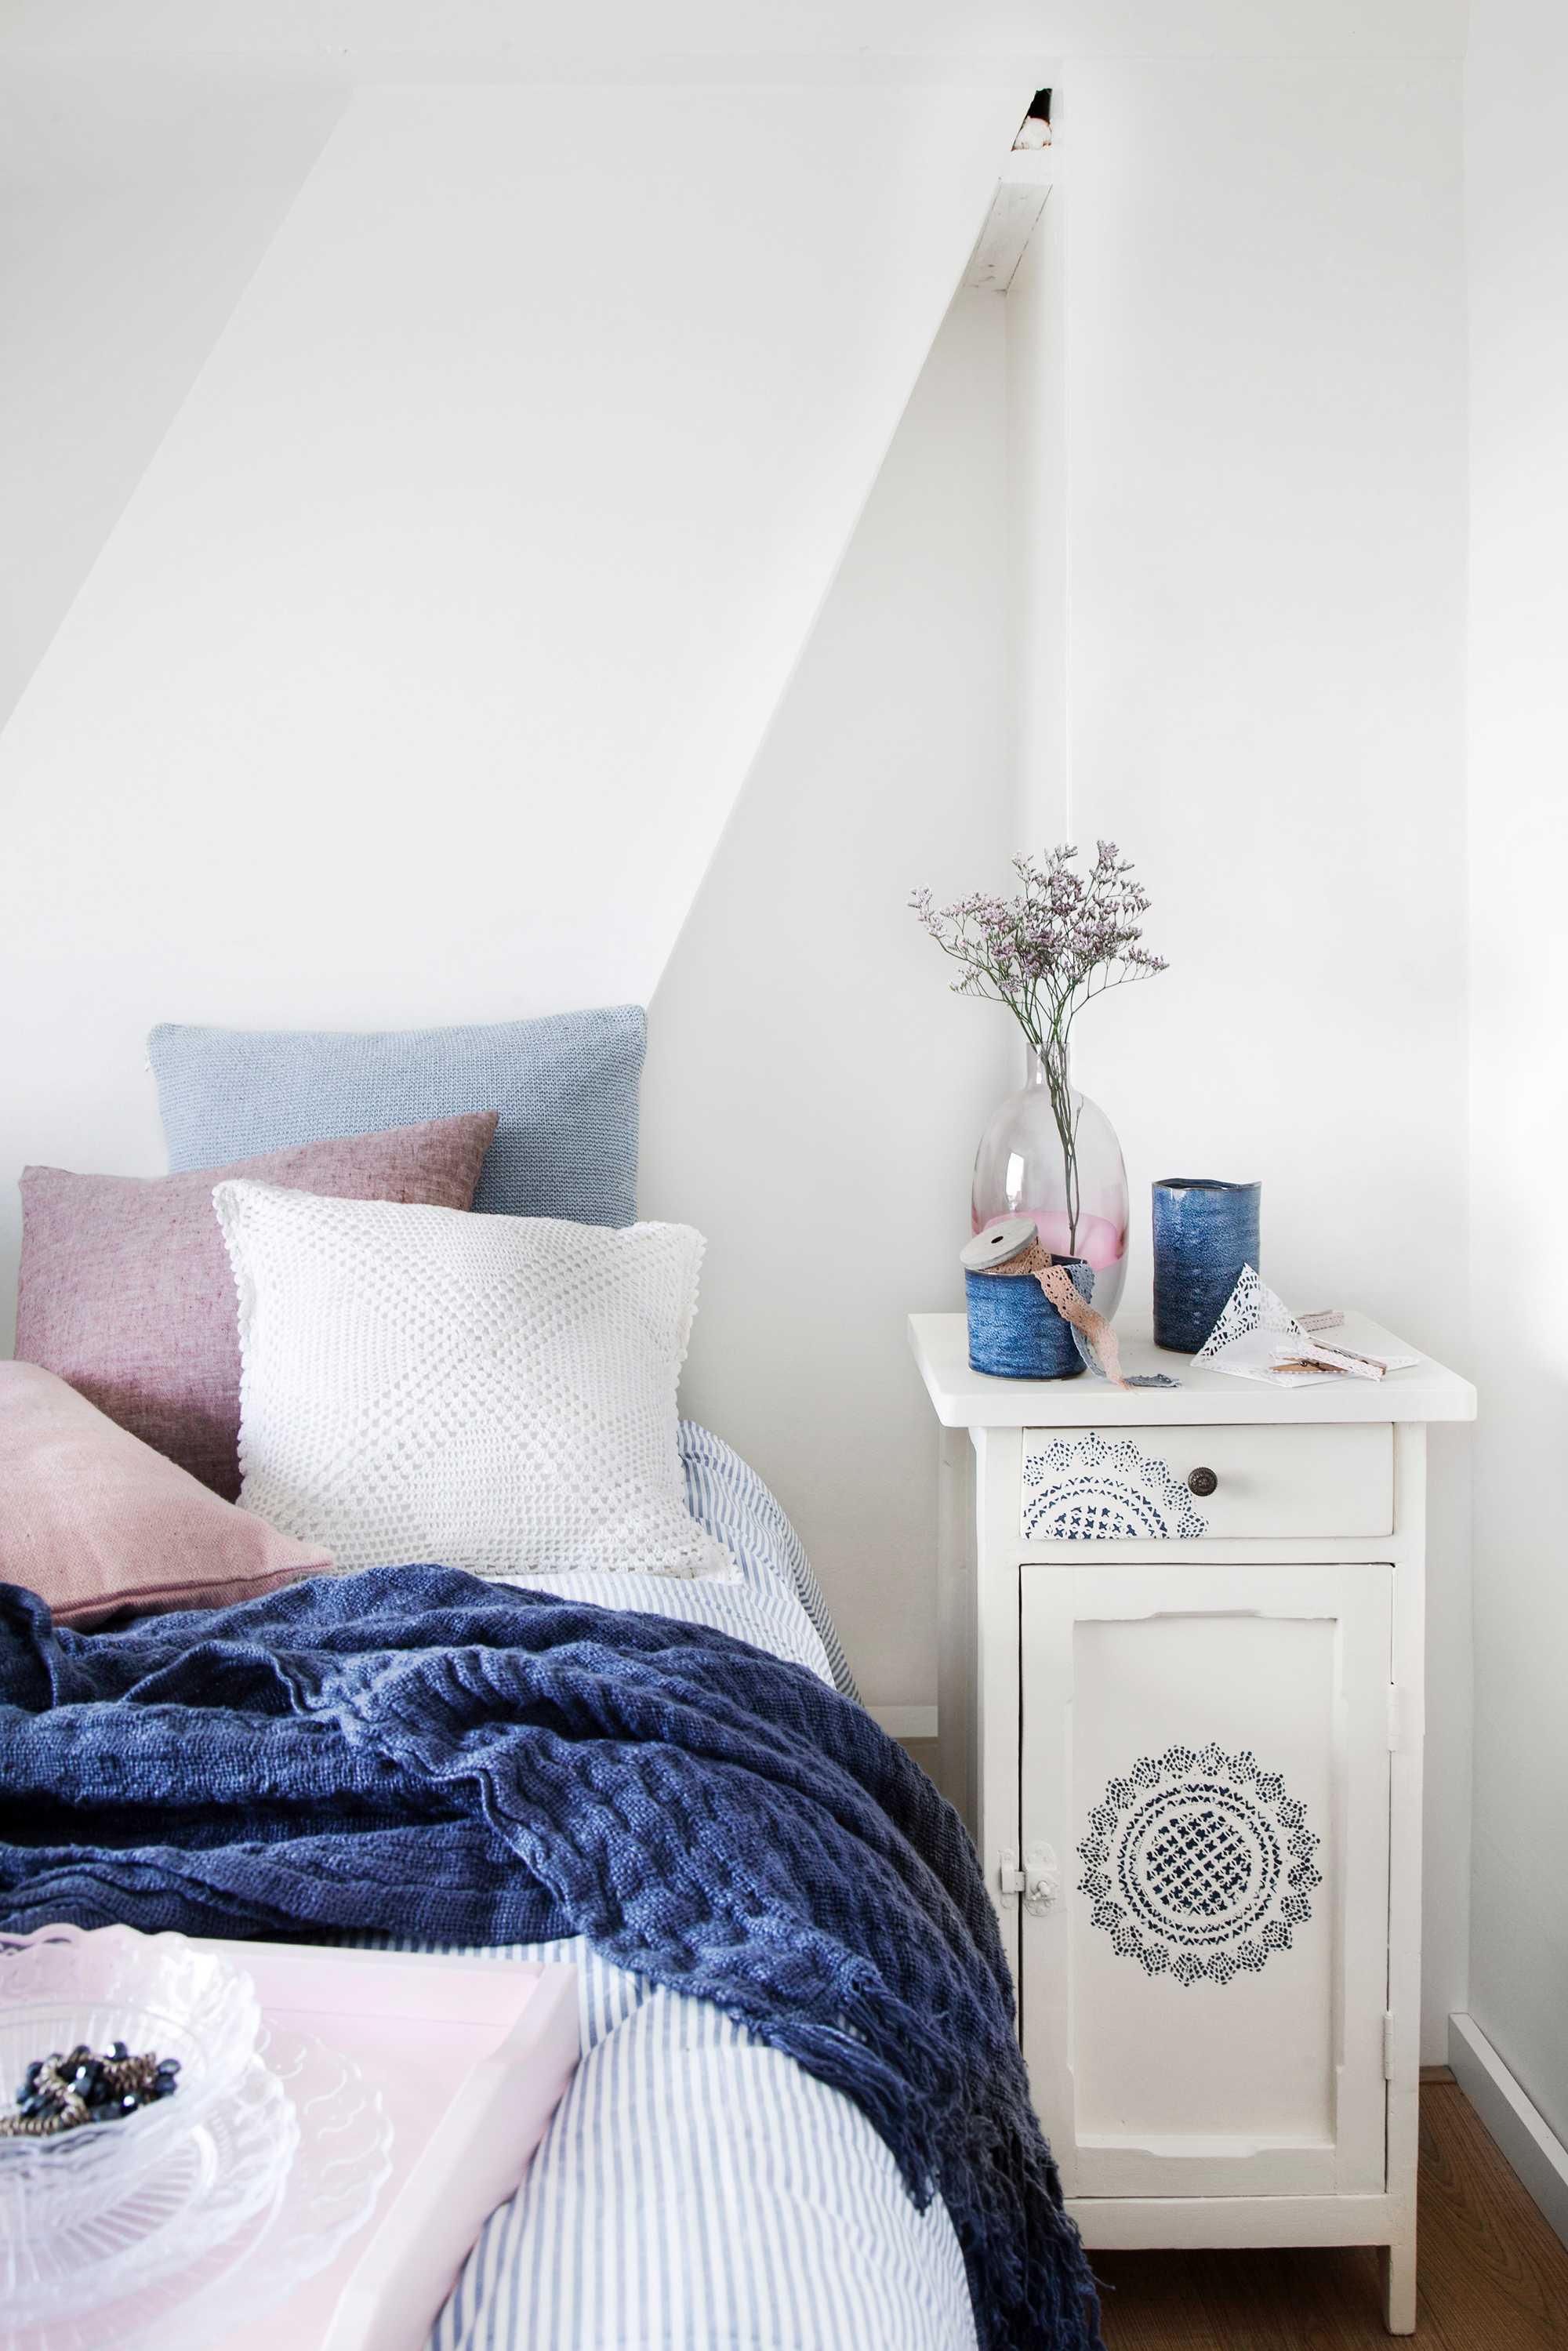 kant slaapkamer nachtkastje